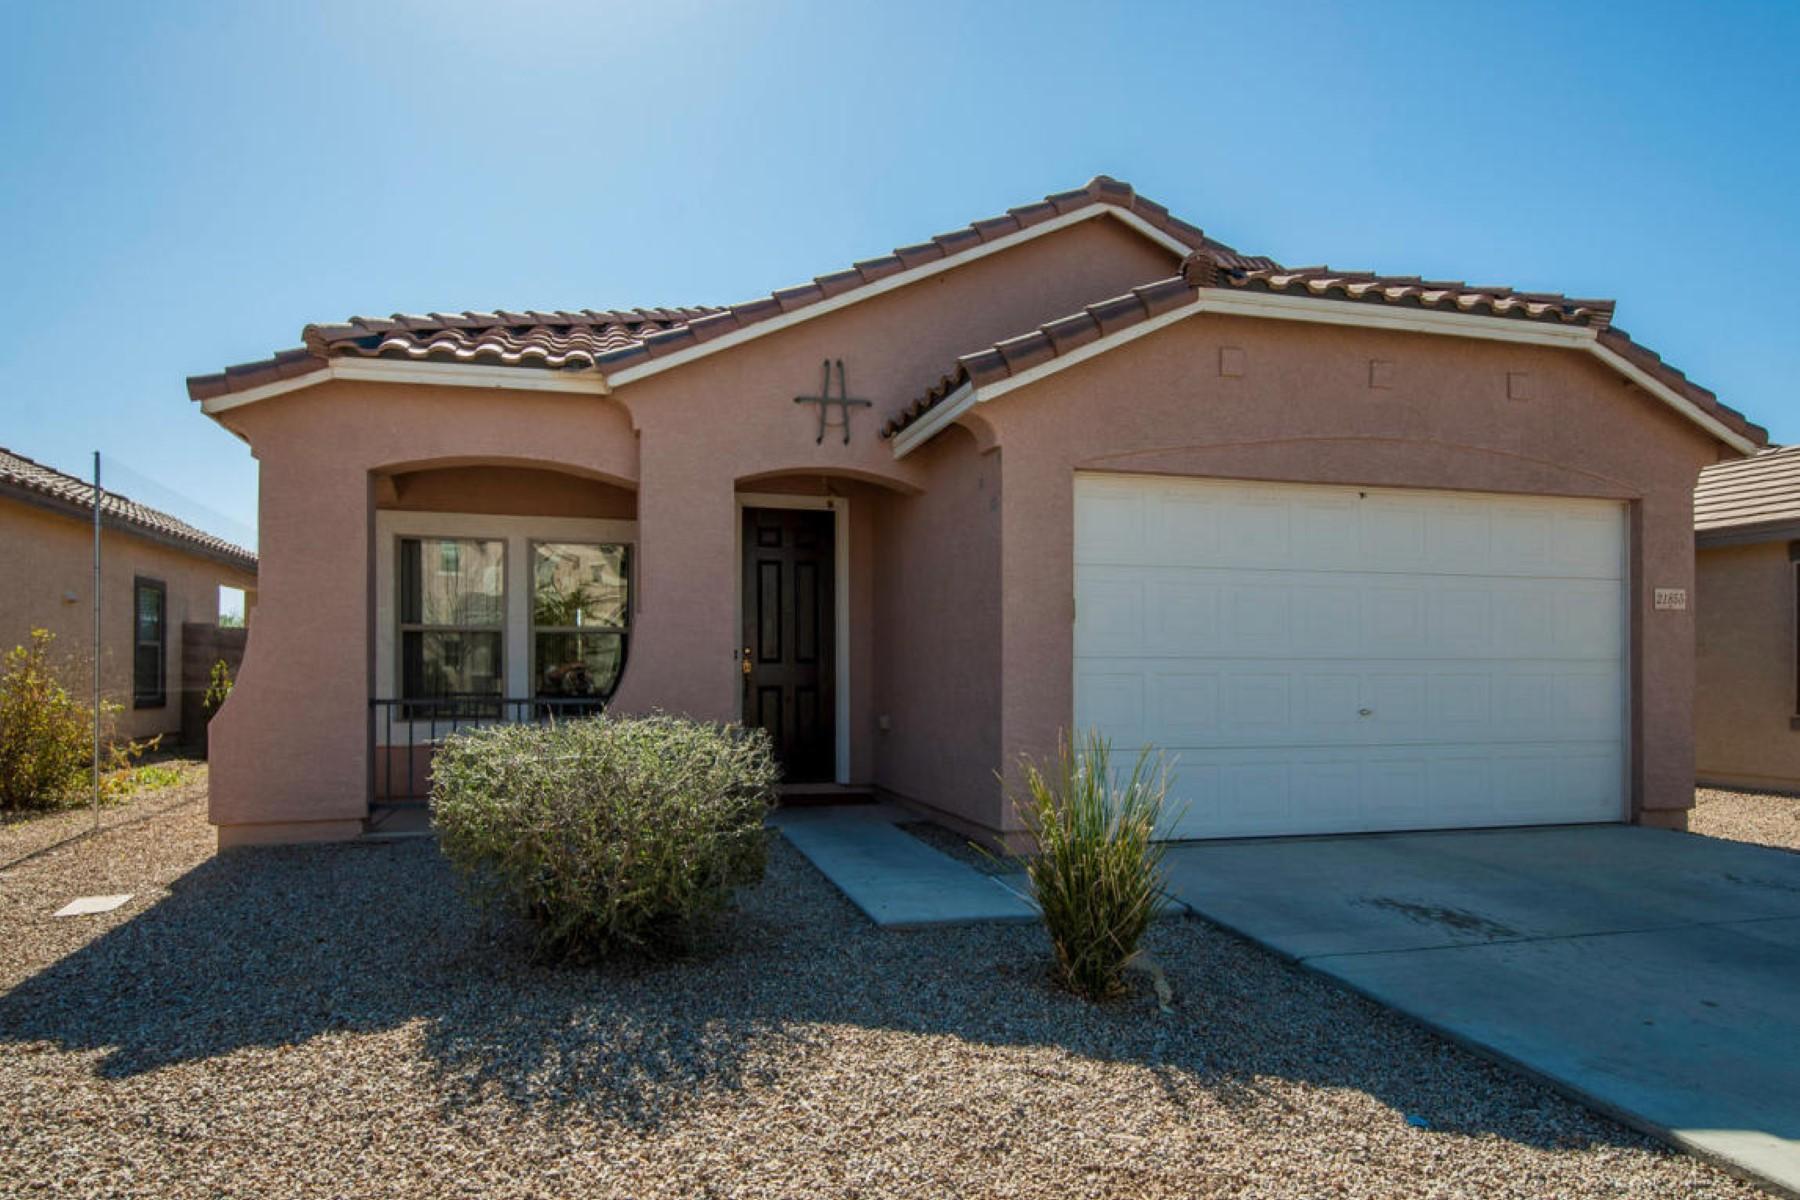 獨棟家庭住宅 為 出售 在 Lovely KB home on a quiet street 21855 E Via Del Palo Dr Queen Creek, 亞利桑那州, 85142 美國